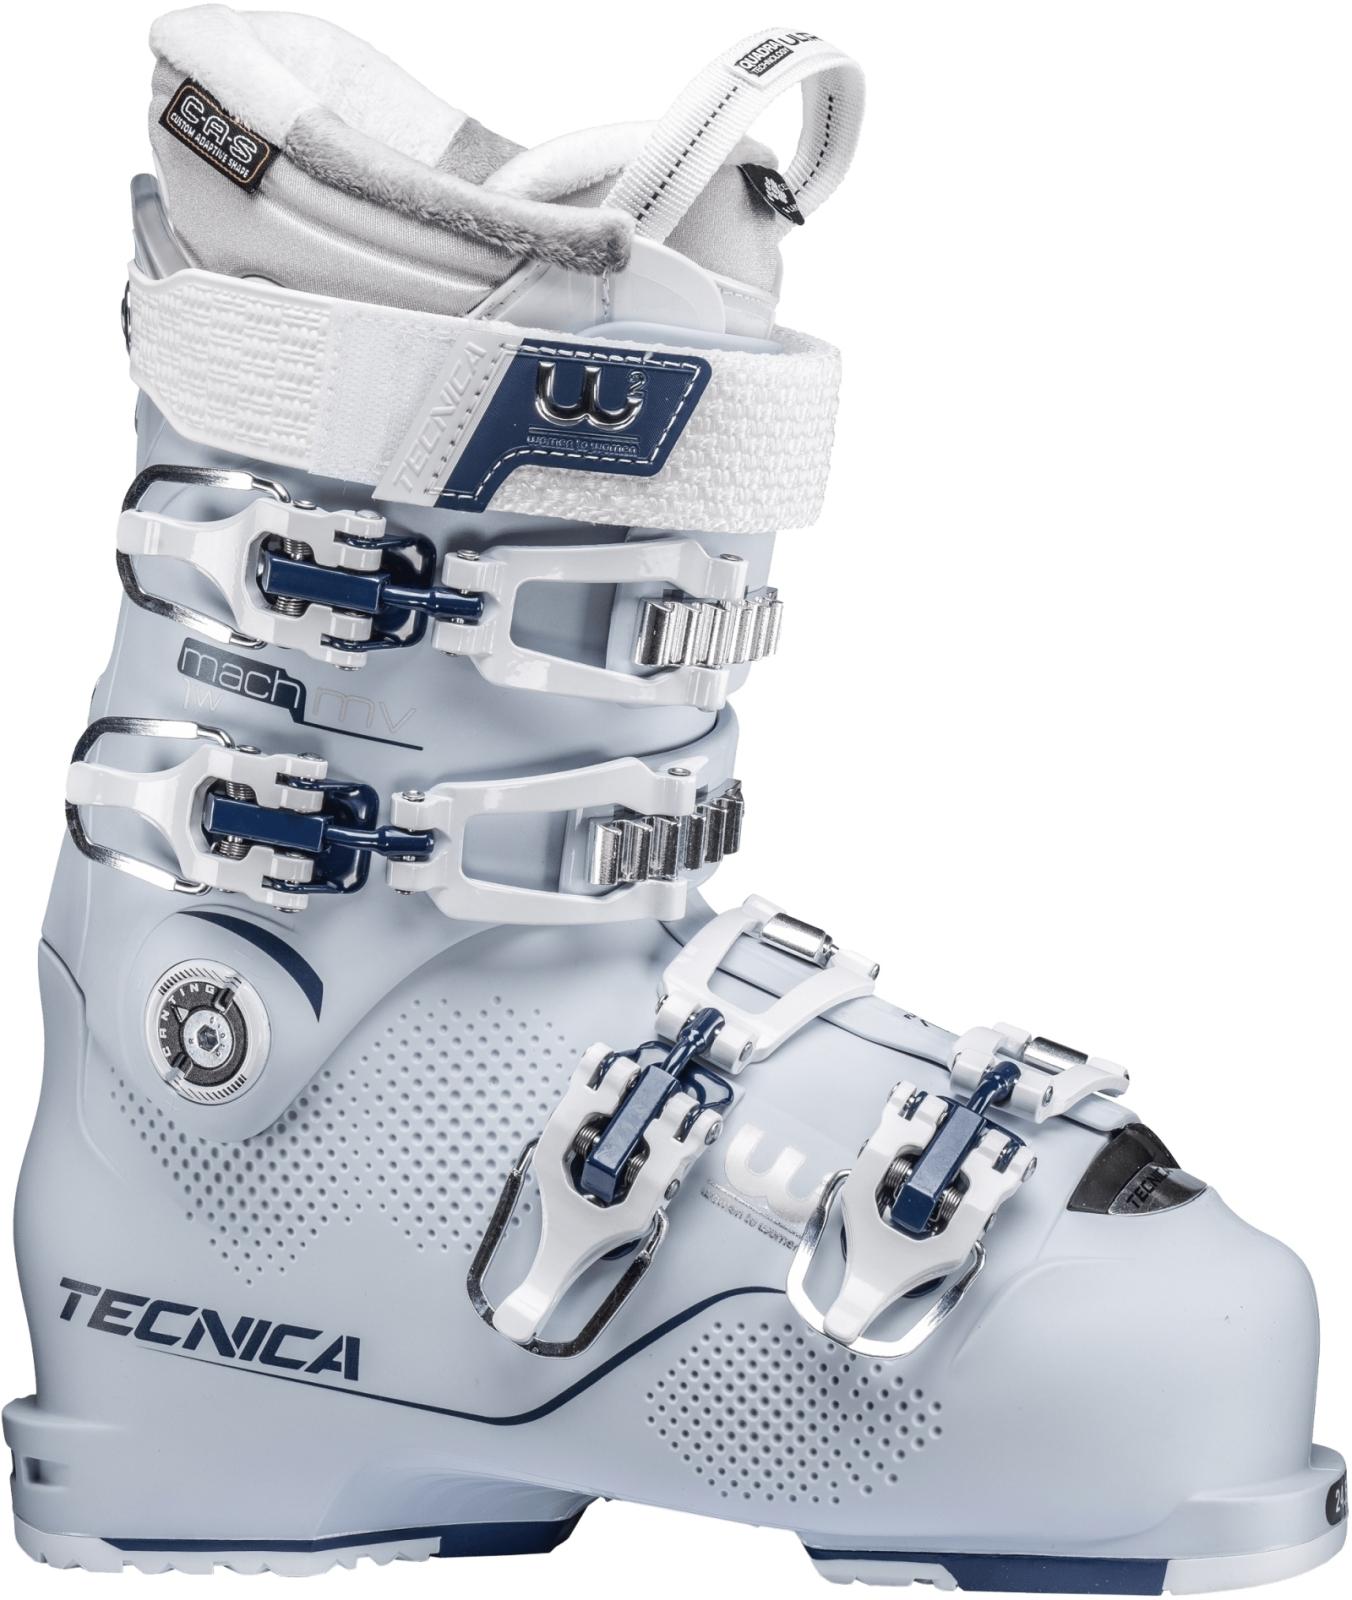 Dámské lyžařské boty Tecnica Mach1 105 W MV - ice - Ski a Bike ... a5e41824ea